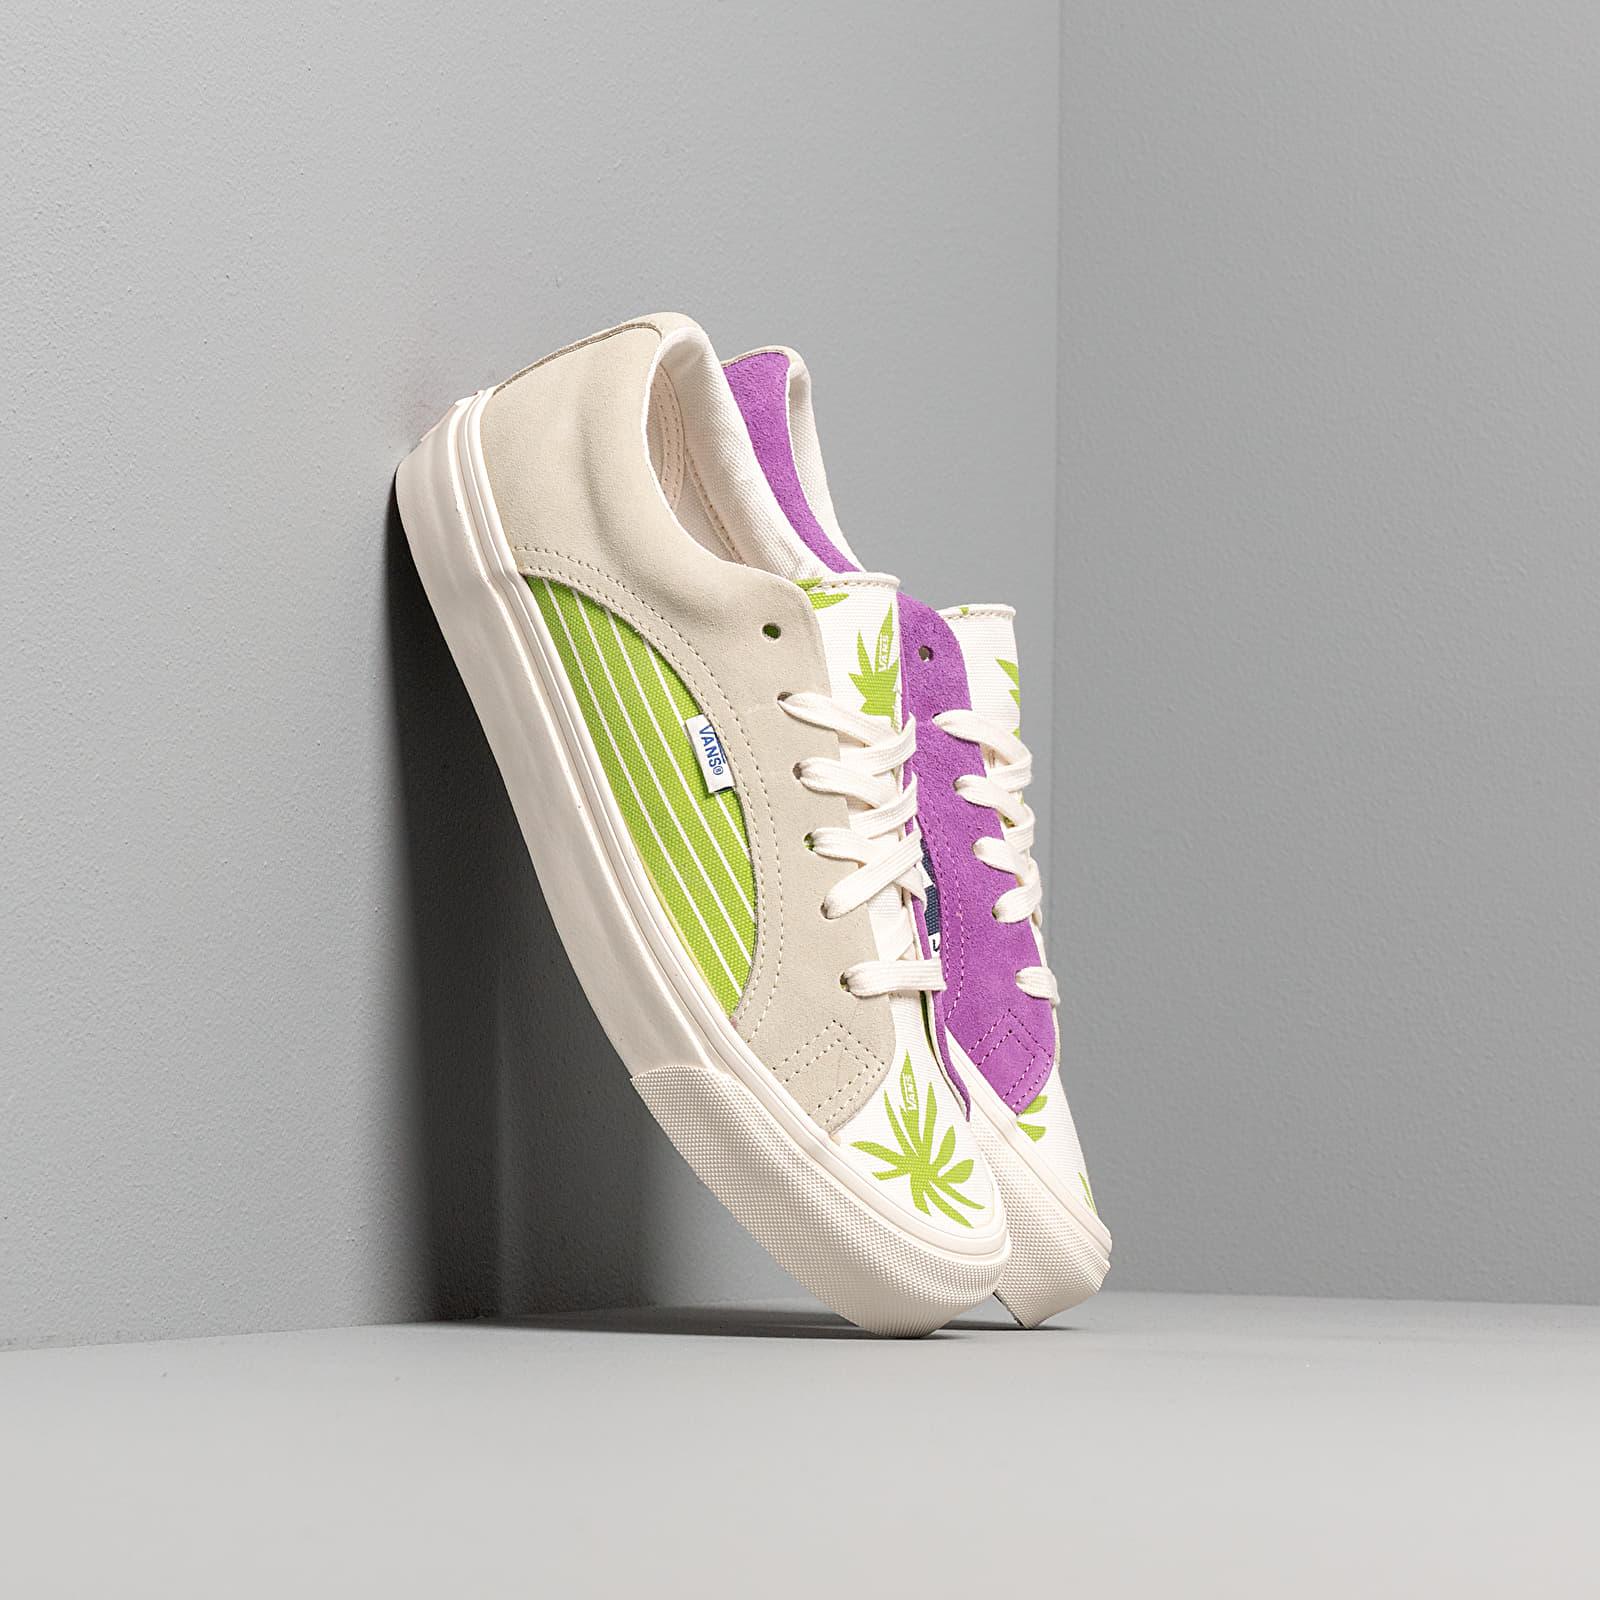 Men's shoes Vans Og Lampin LX (Suede/ Canvas) Overcast Lime Green